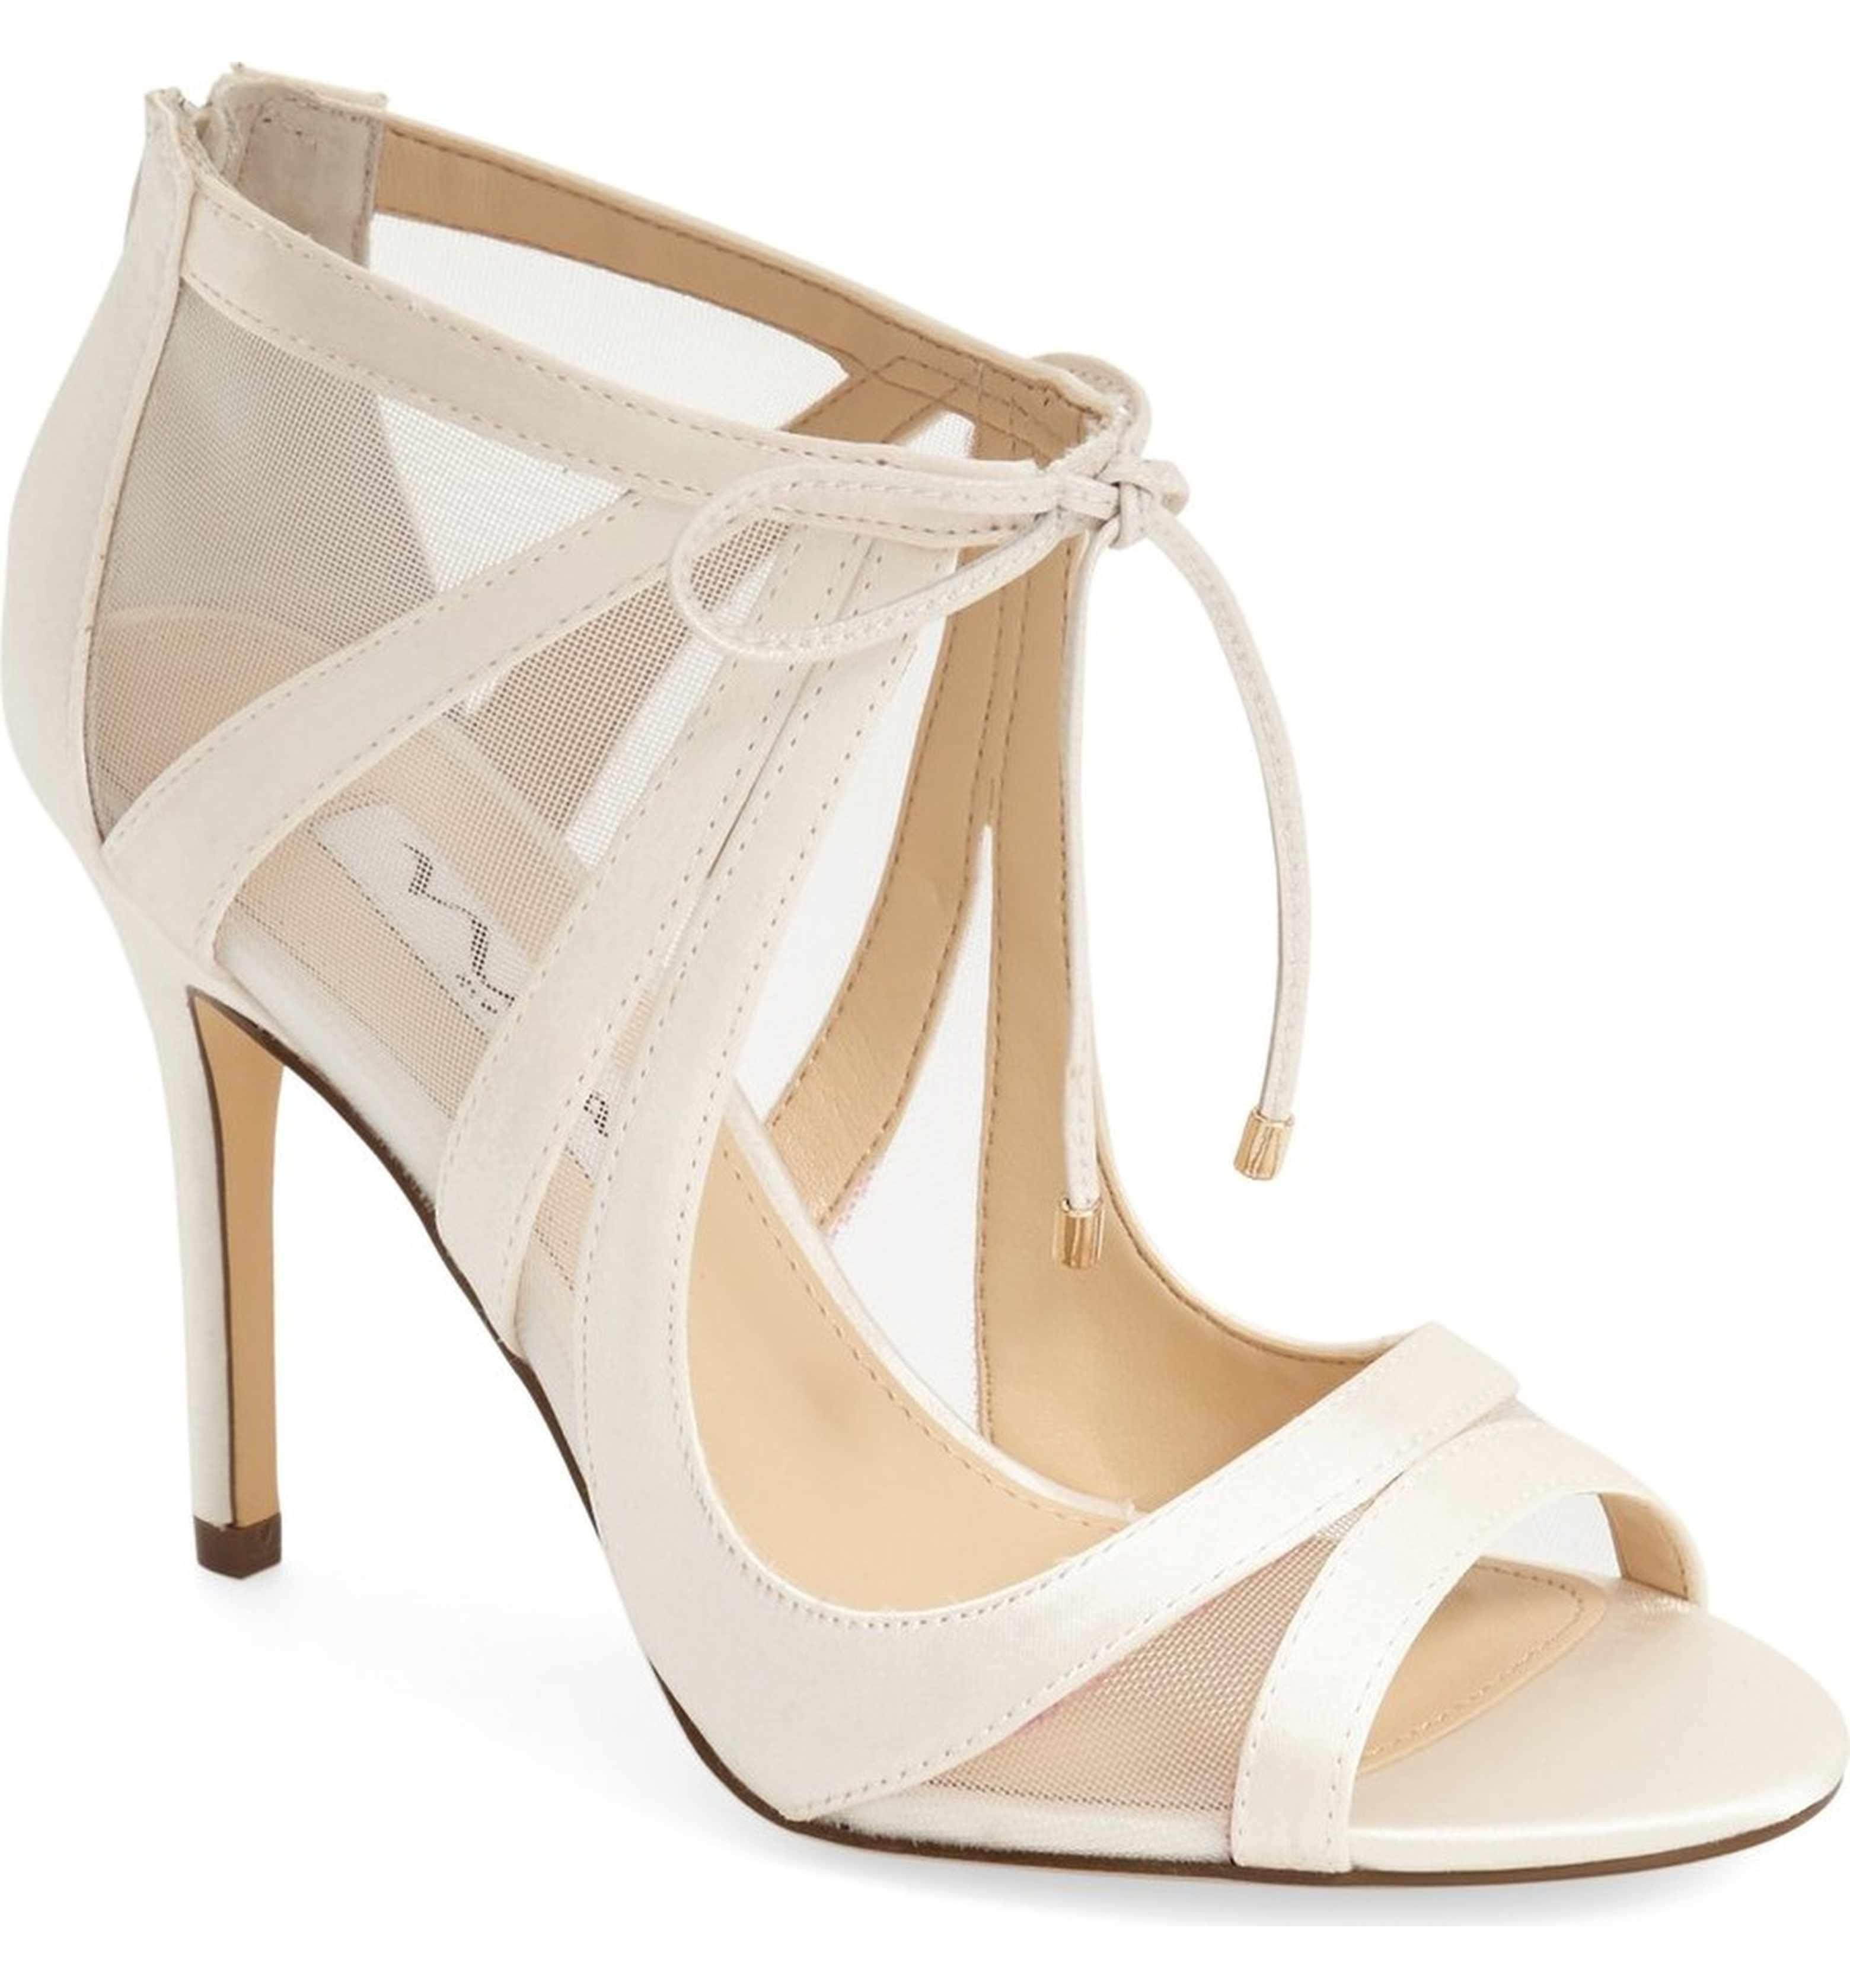 NINA Women's Cherie Illusion Sandal kGpPYOm2